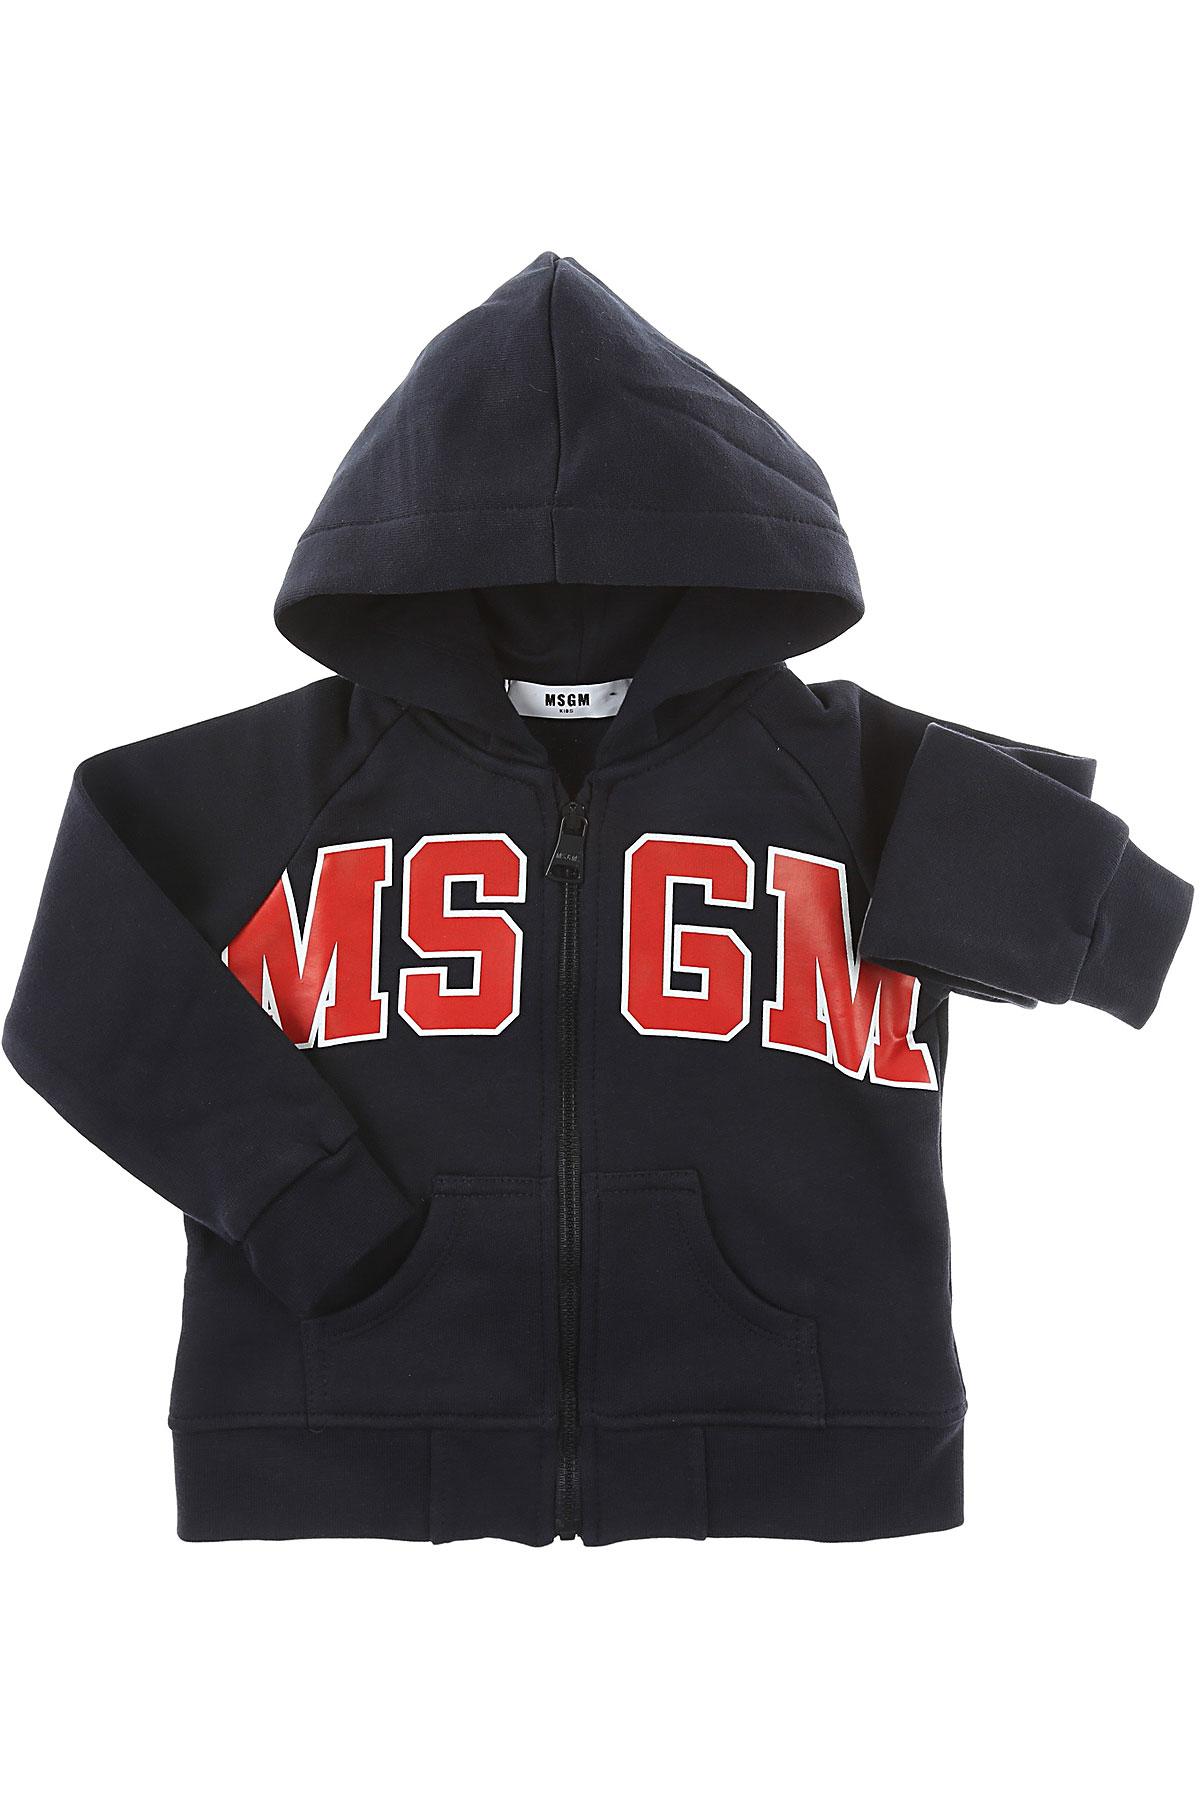 Image of MSGM Baby Sweatshirts & Hoodies for Boys, Blue, Cotton, 2017, 12M 18M 6M 9M